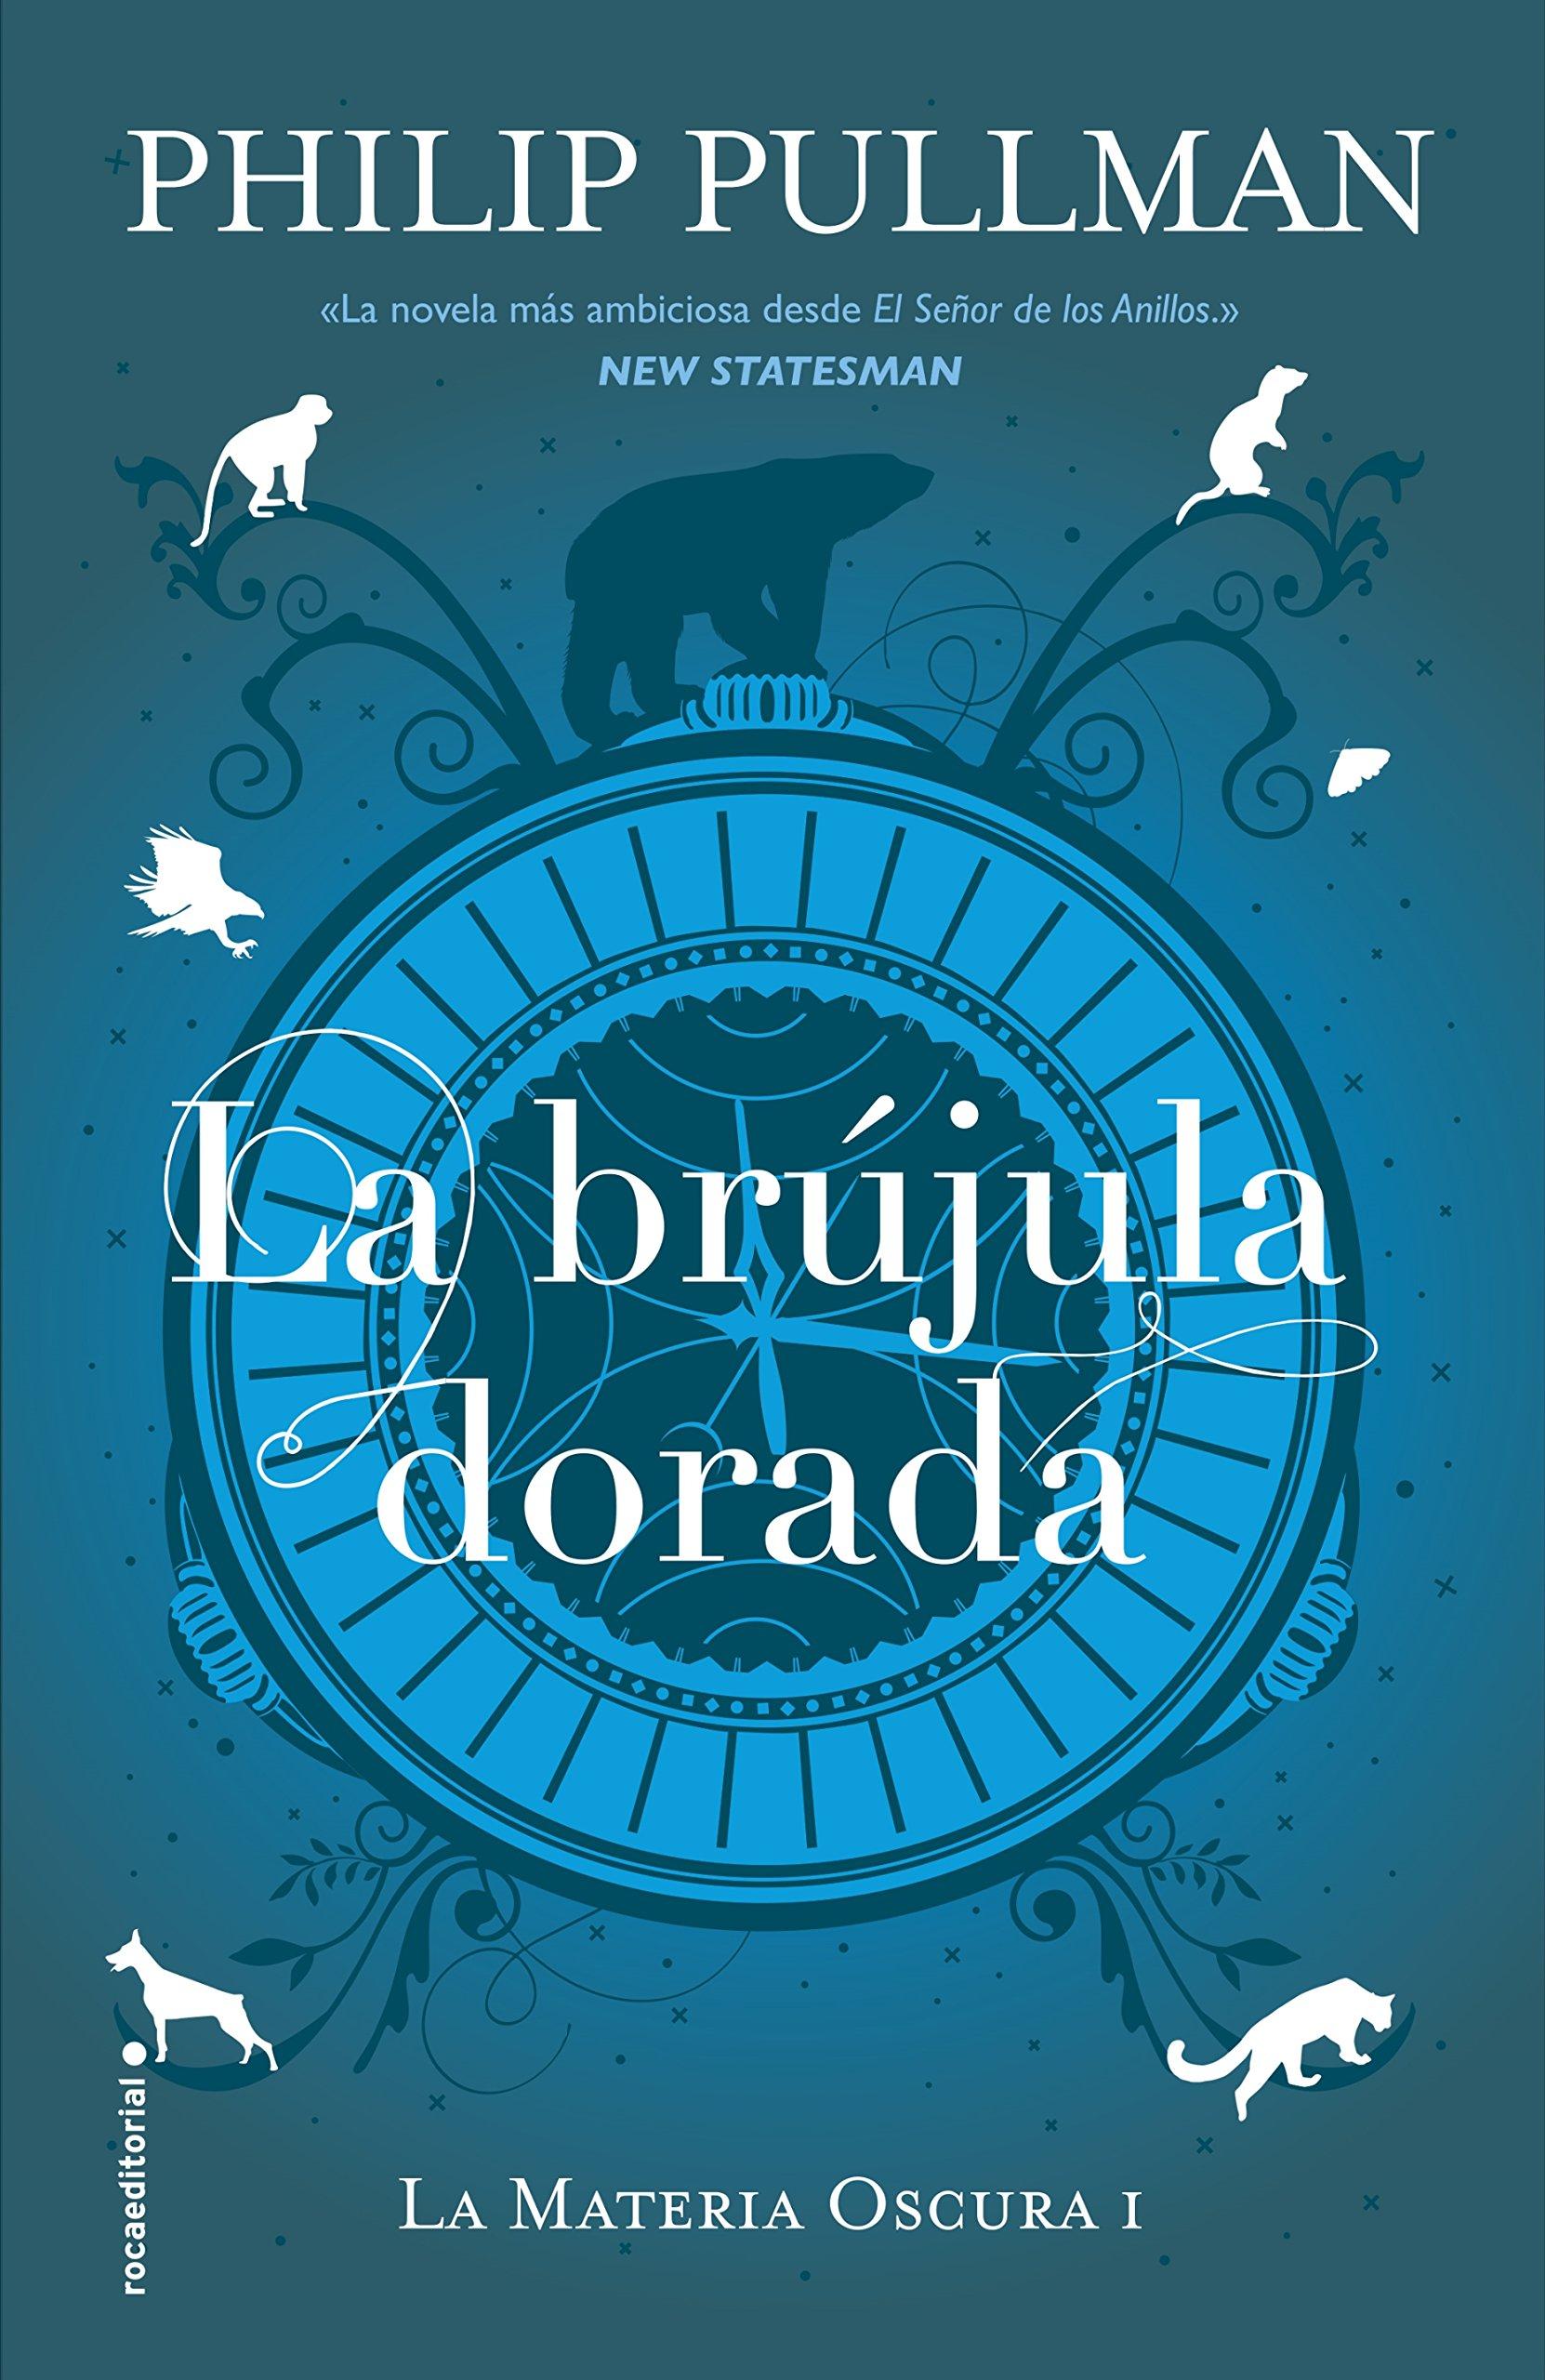 Amazon.com: La brújula dorada (Spanish Edition) (La Materia Oscura)  (9788417092566): Philip Pullman: Books